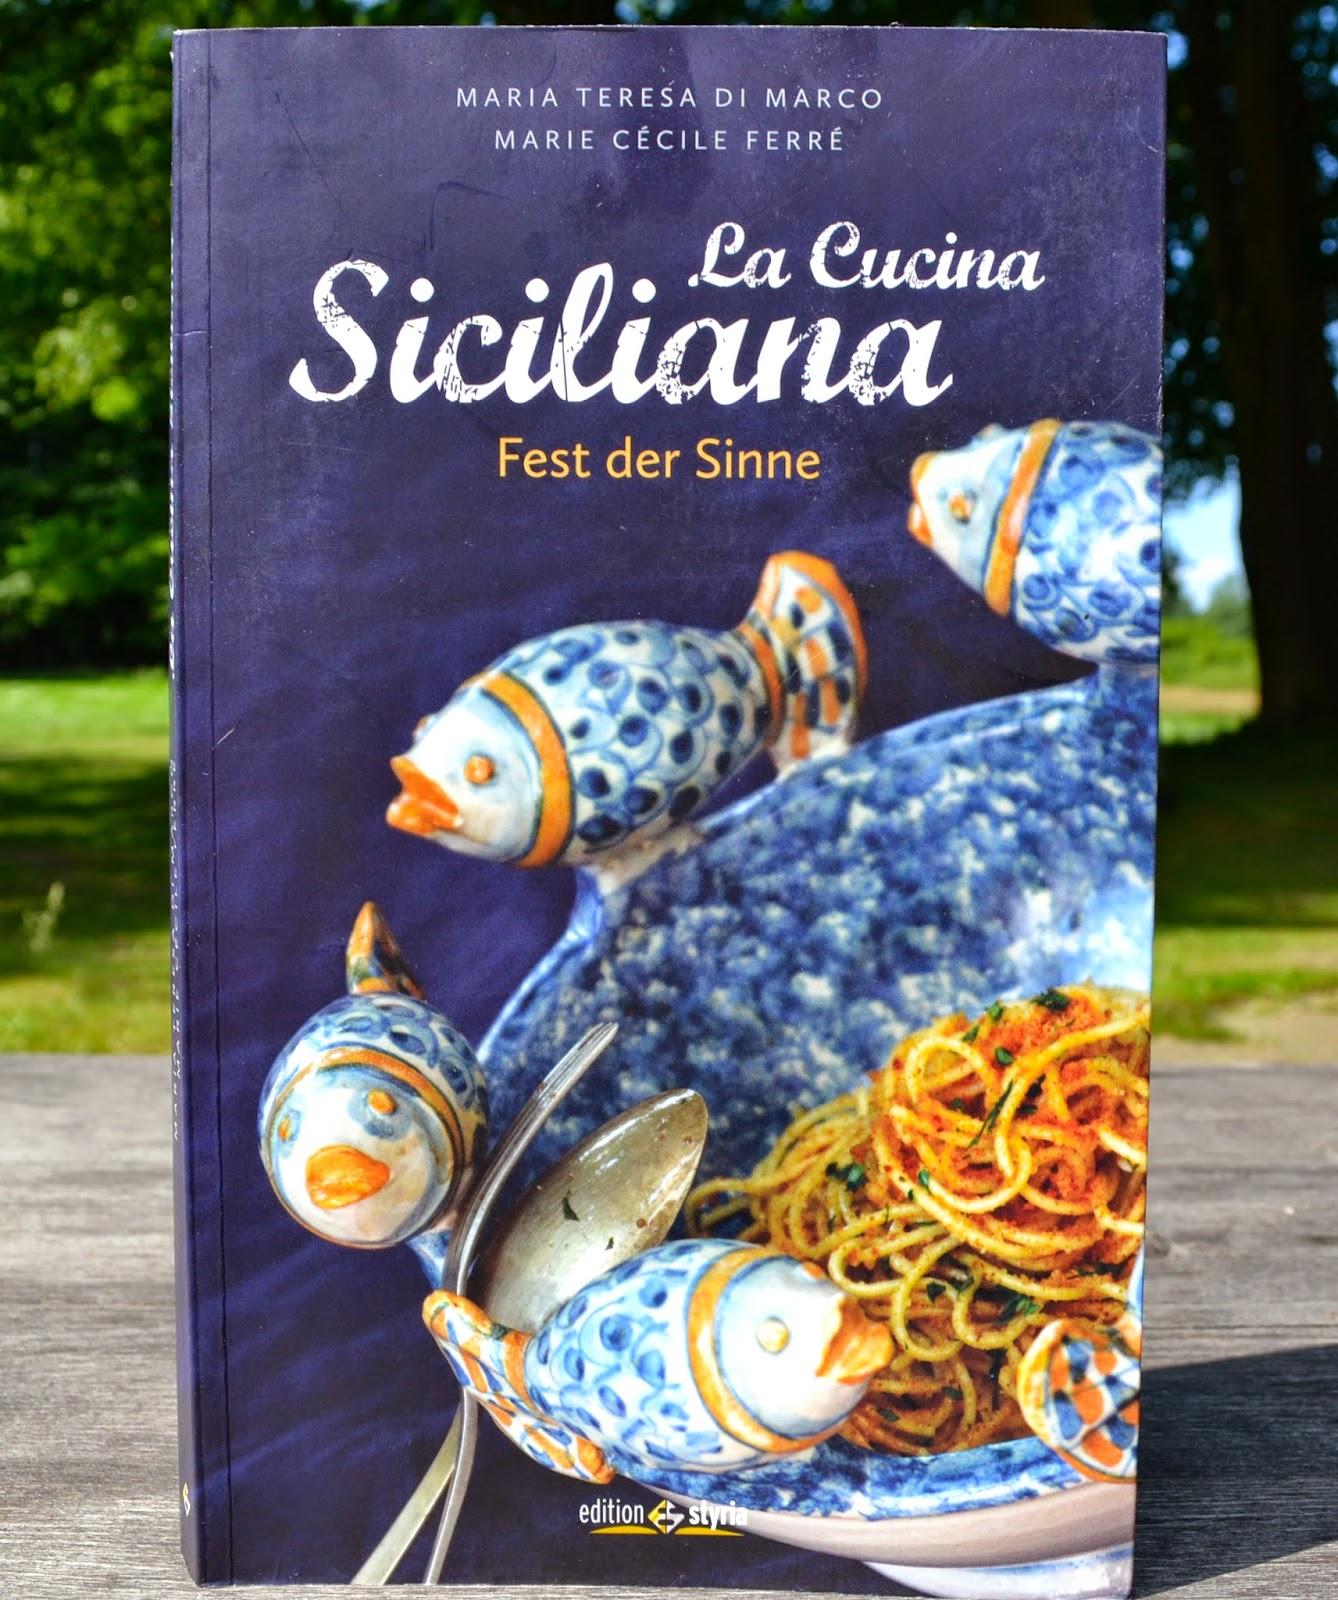 Clubzimmer rezension la cucina siciliana freundschaft auf den zweiten blick - La cucina siciliana ...